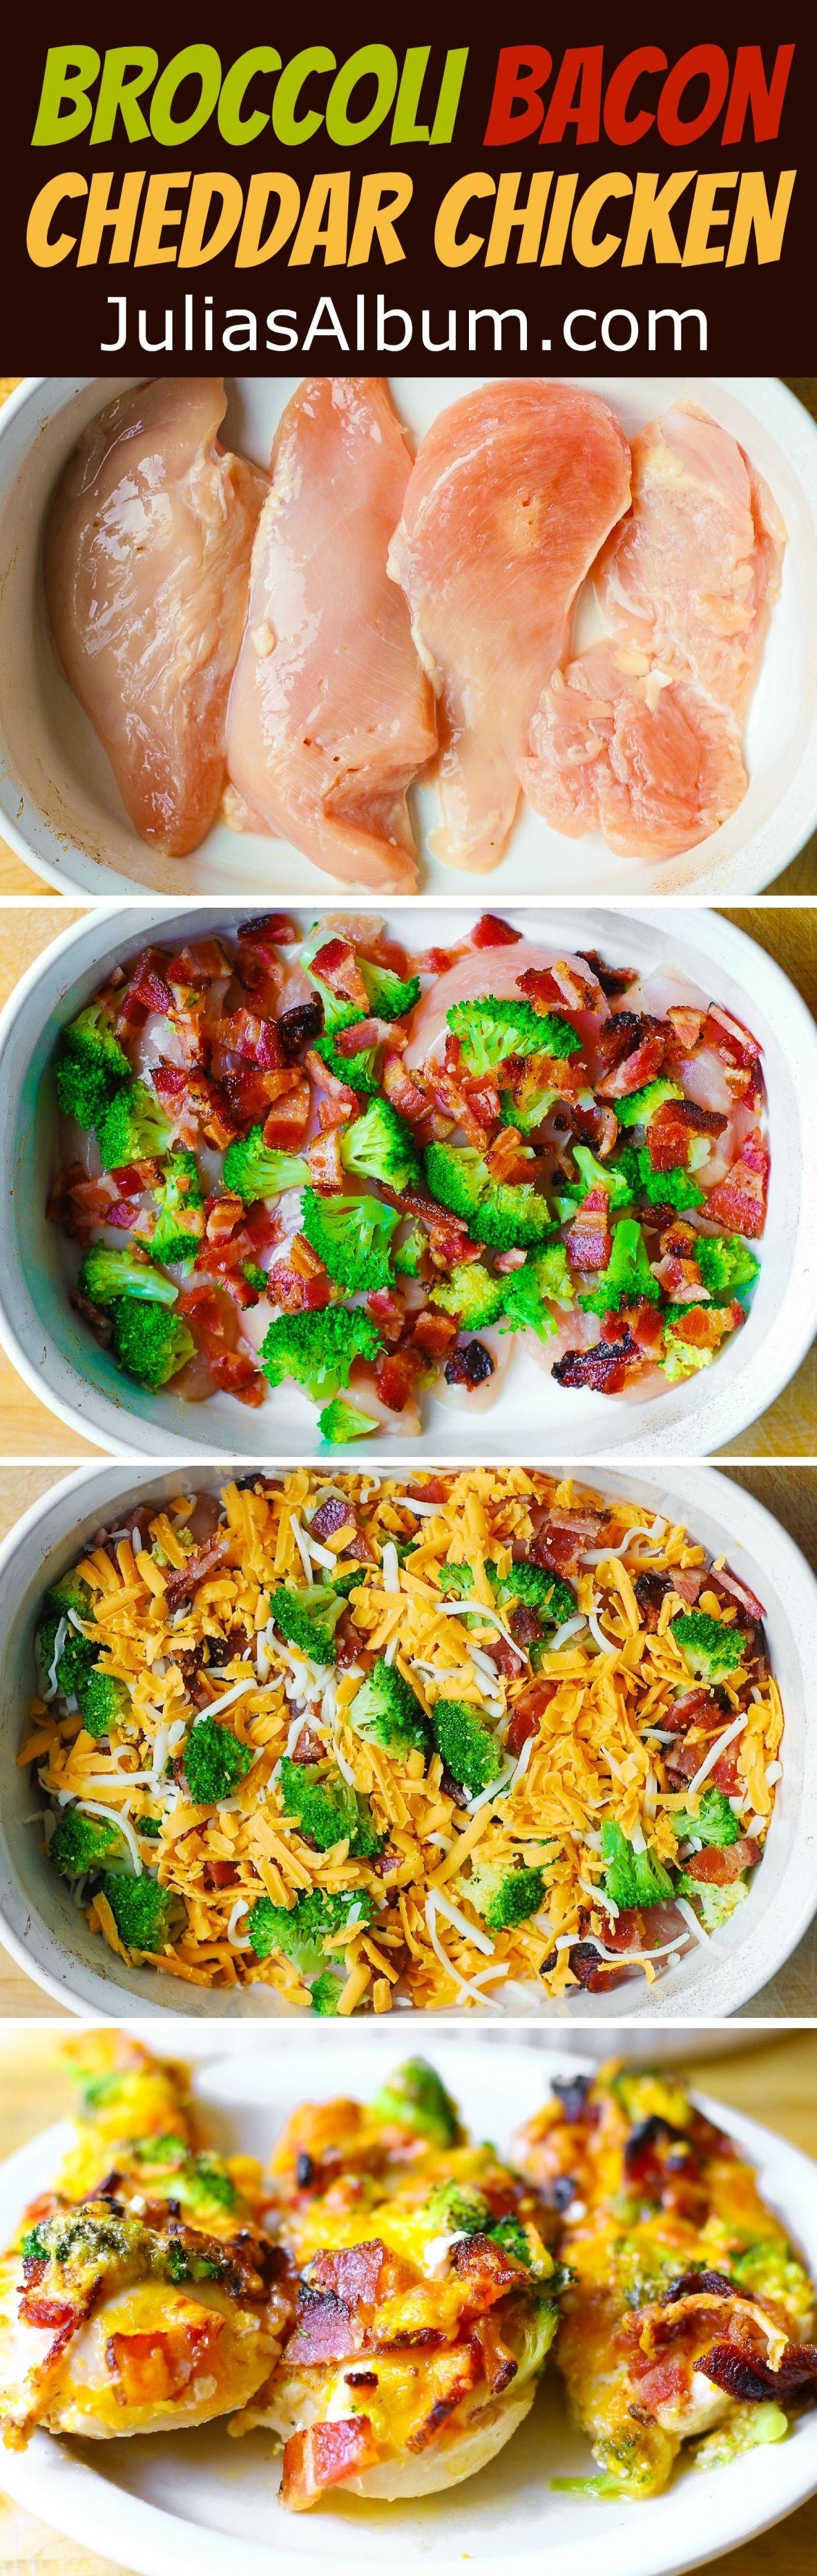 Broccoli Bacon Cheddar Chicken Recipe Dinner Meals Pinterest